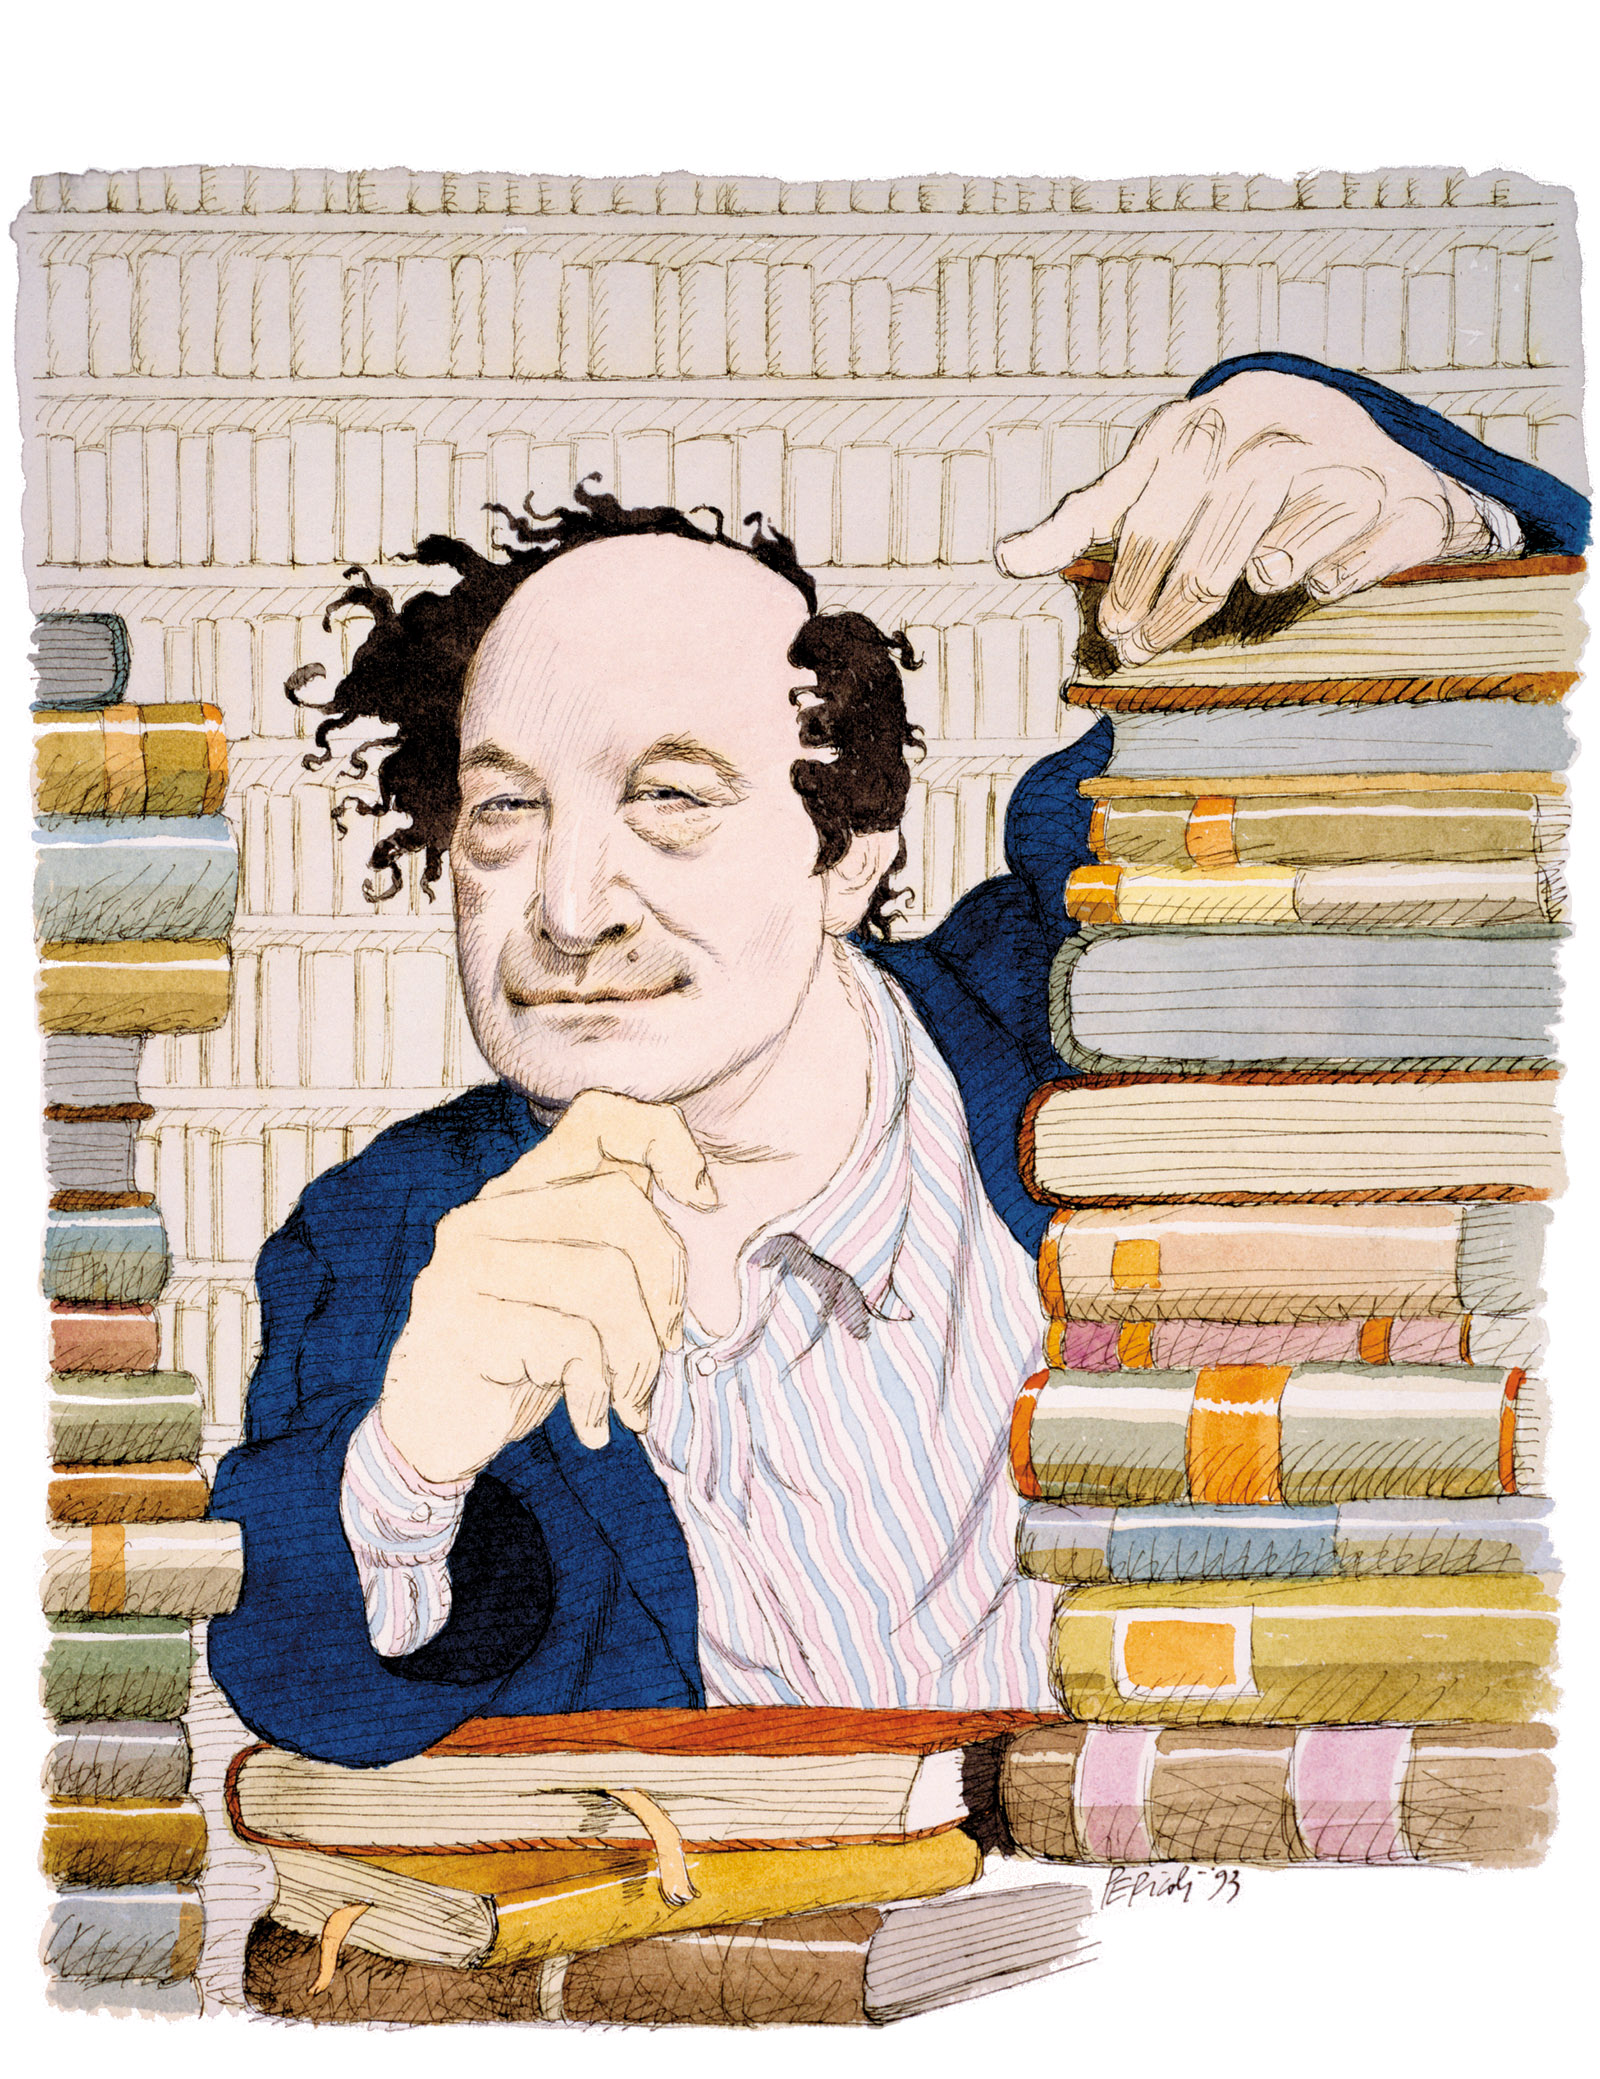 Roberto Calasso; drawing by Tullio Pericoli